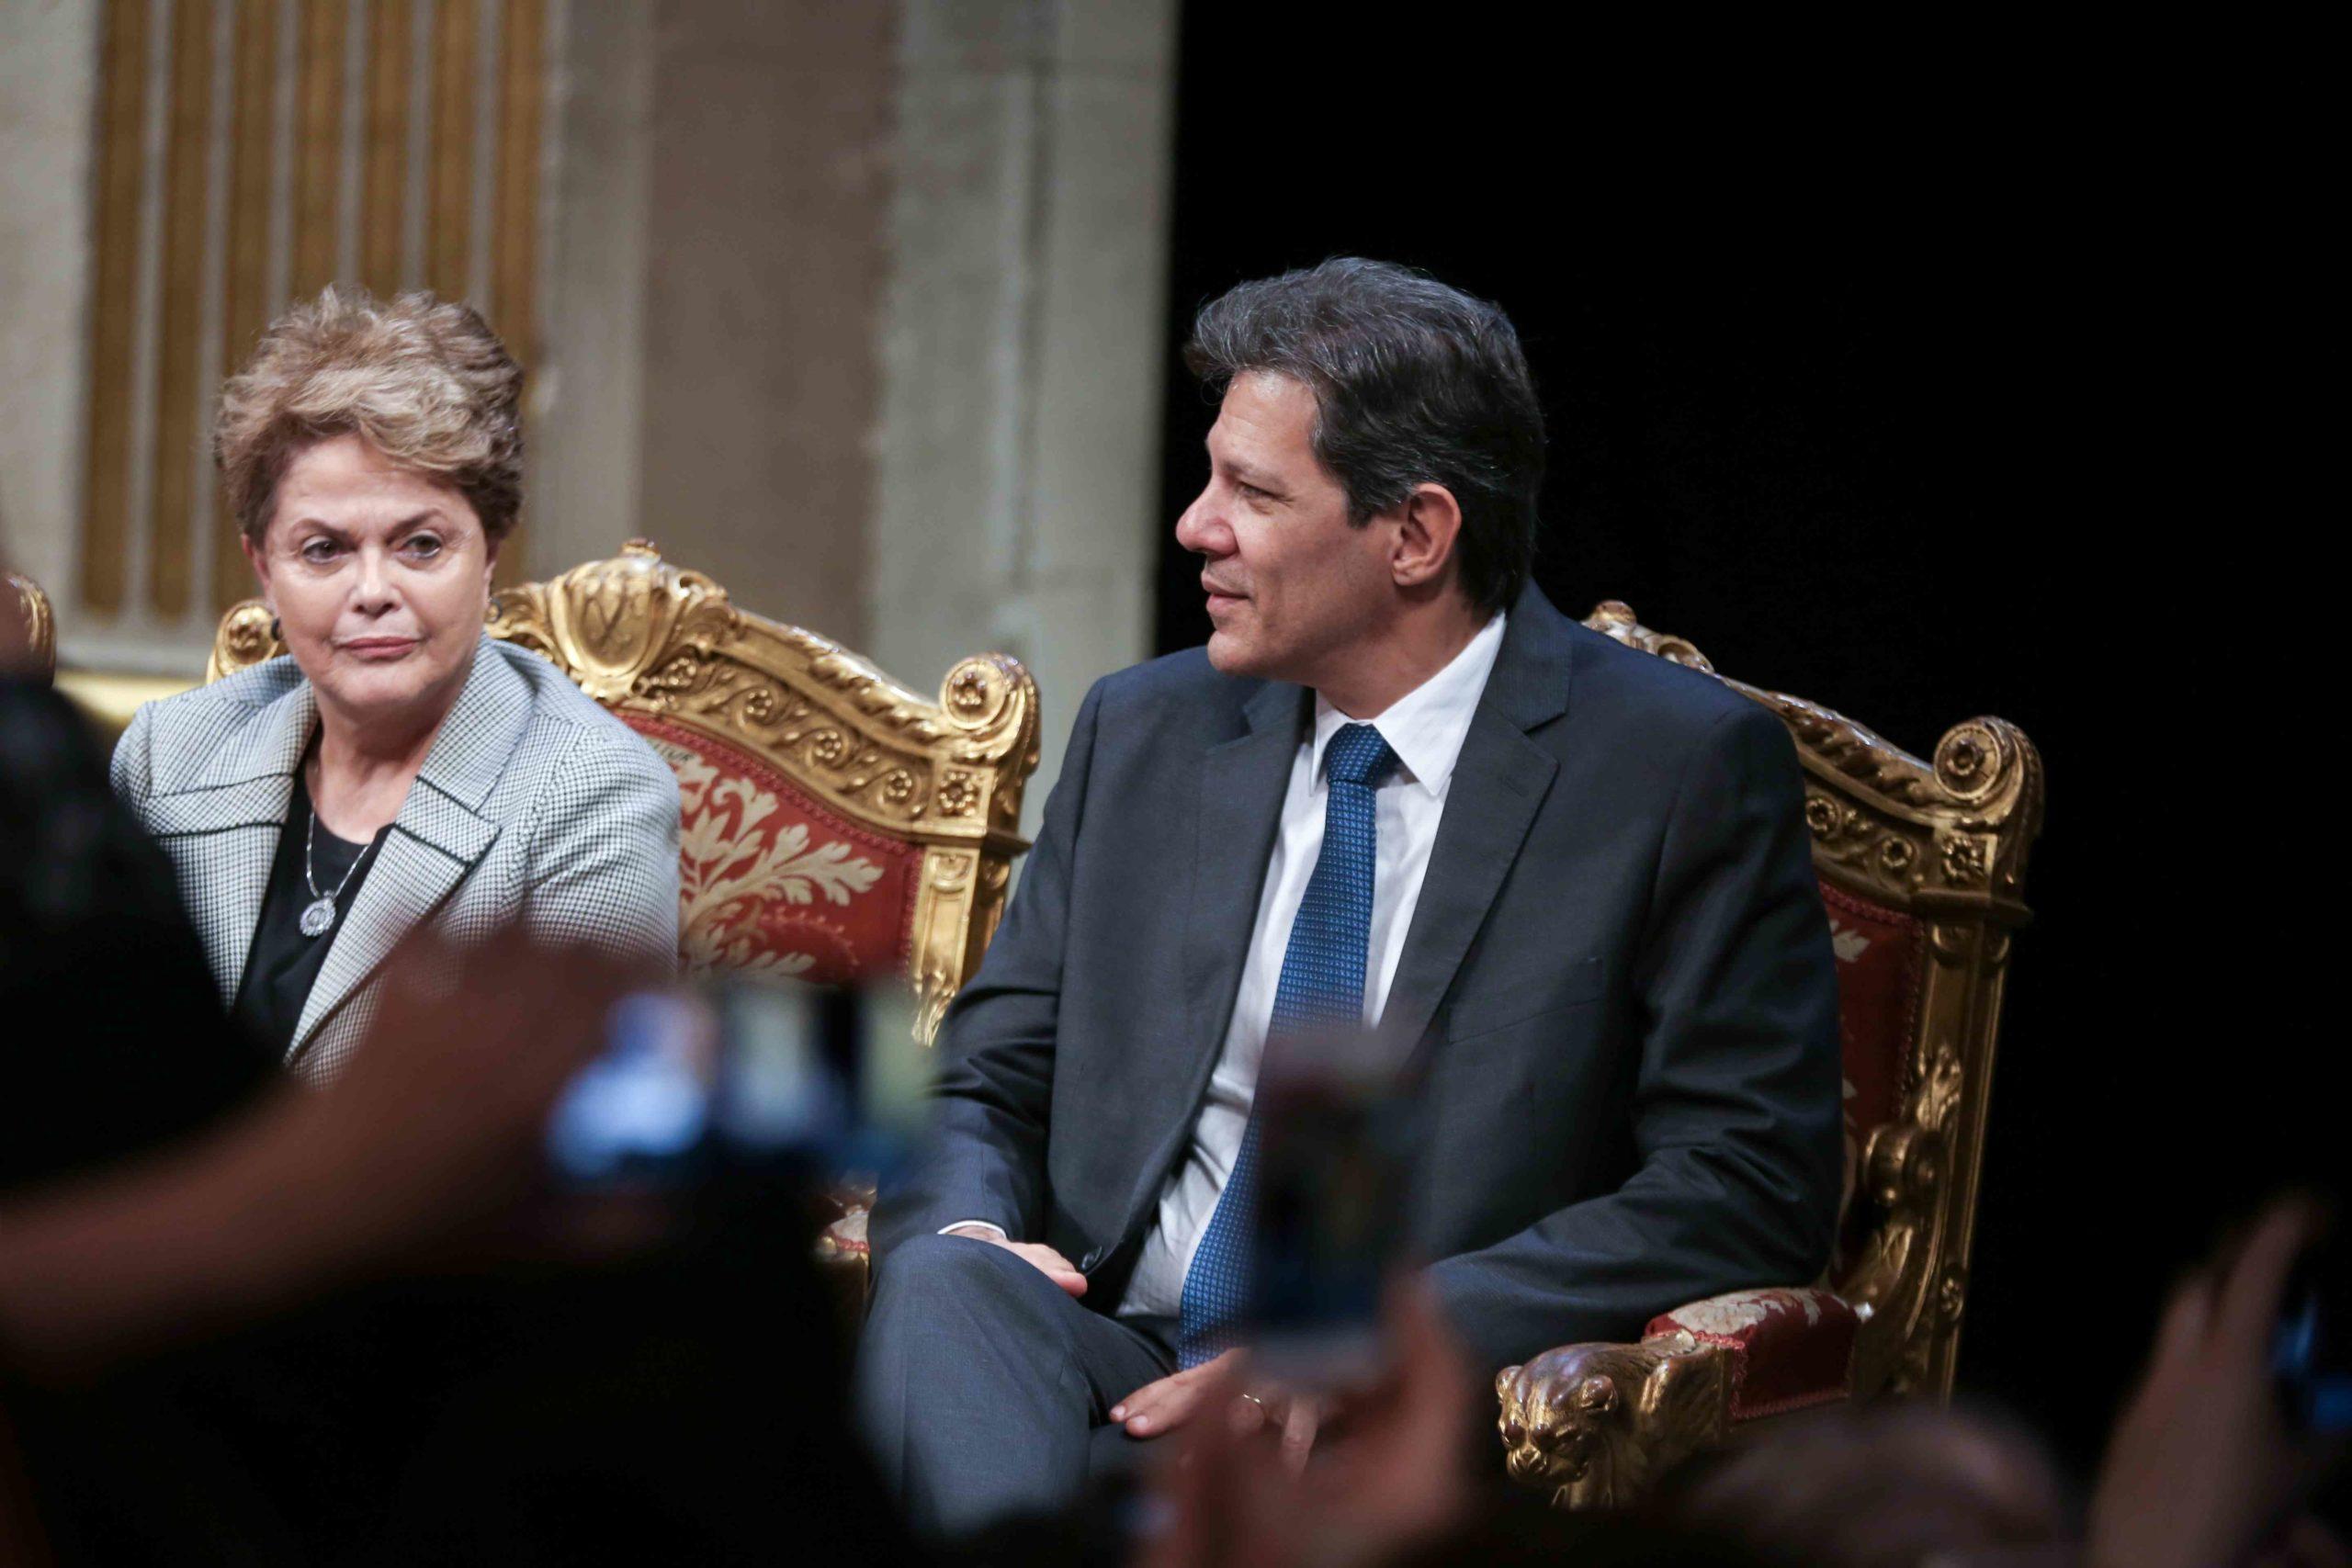 Dilma Rousseff et Fernando Hadda. © Michel Stoupak. Lun 02.03.2020, 18:24:34.